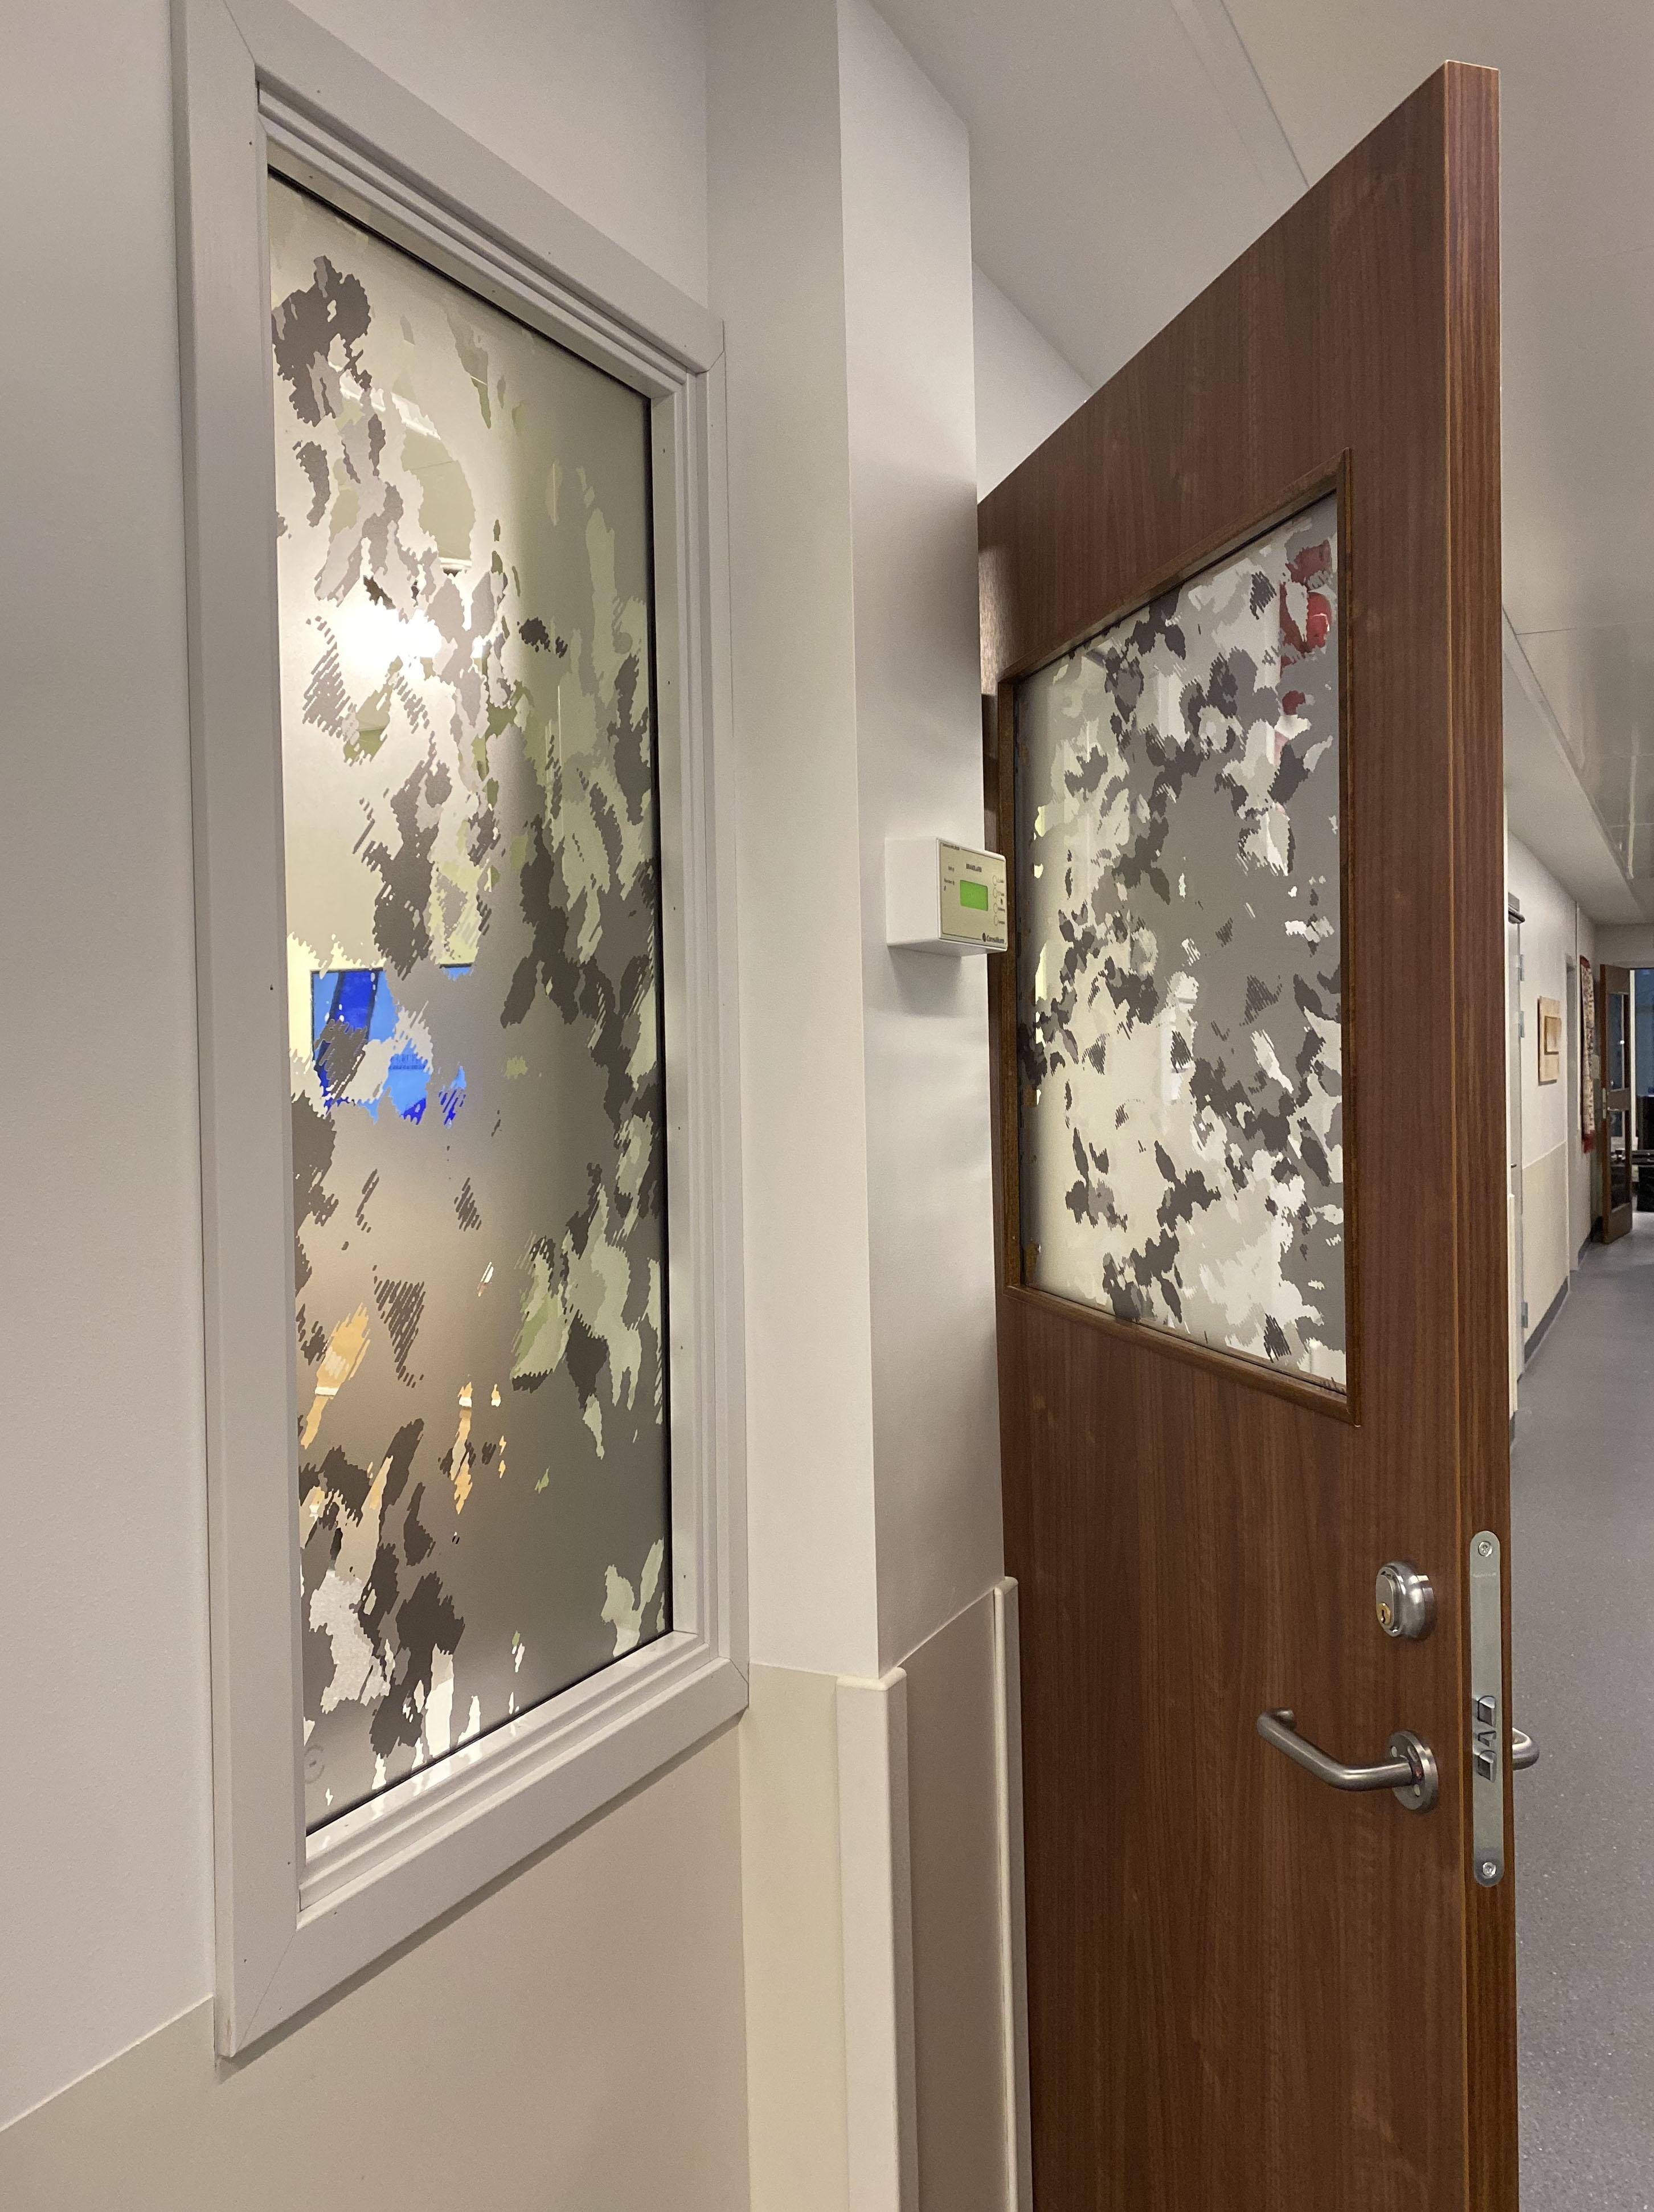 inside the psychiatric ward of Nacka hospital